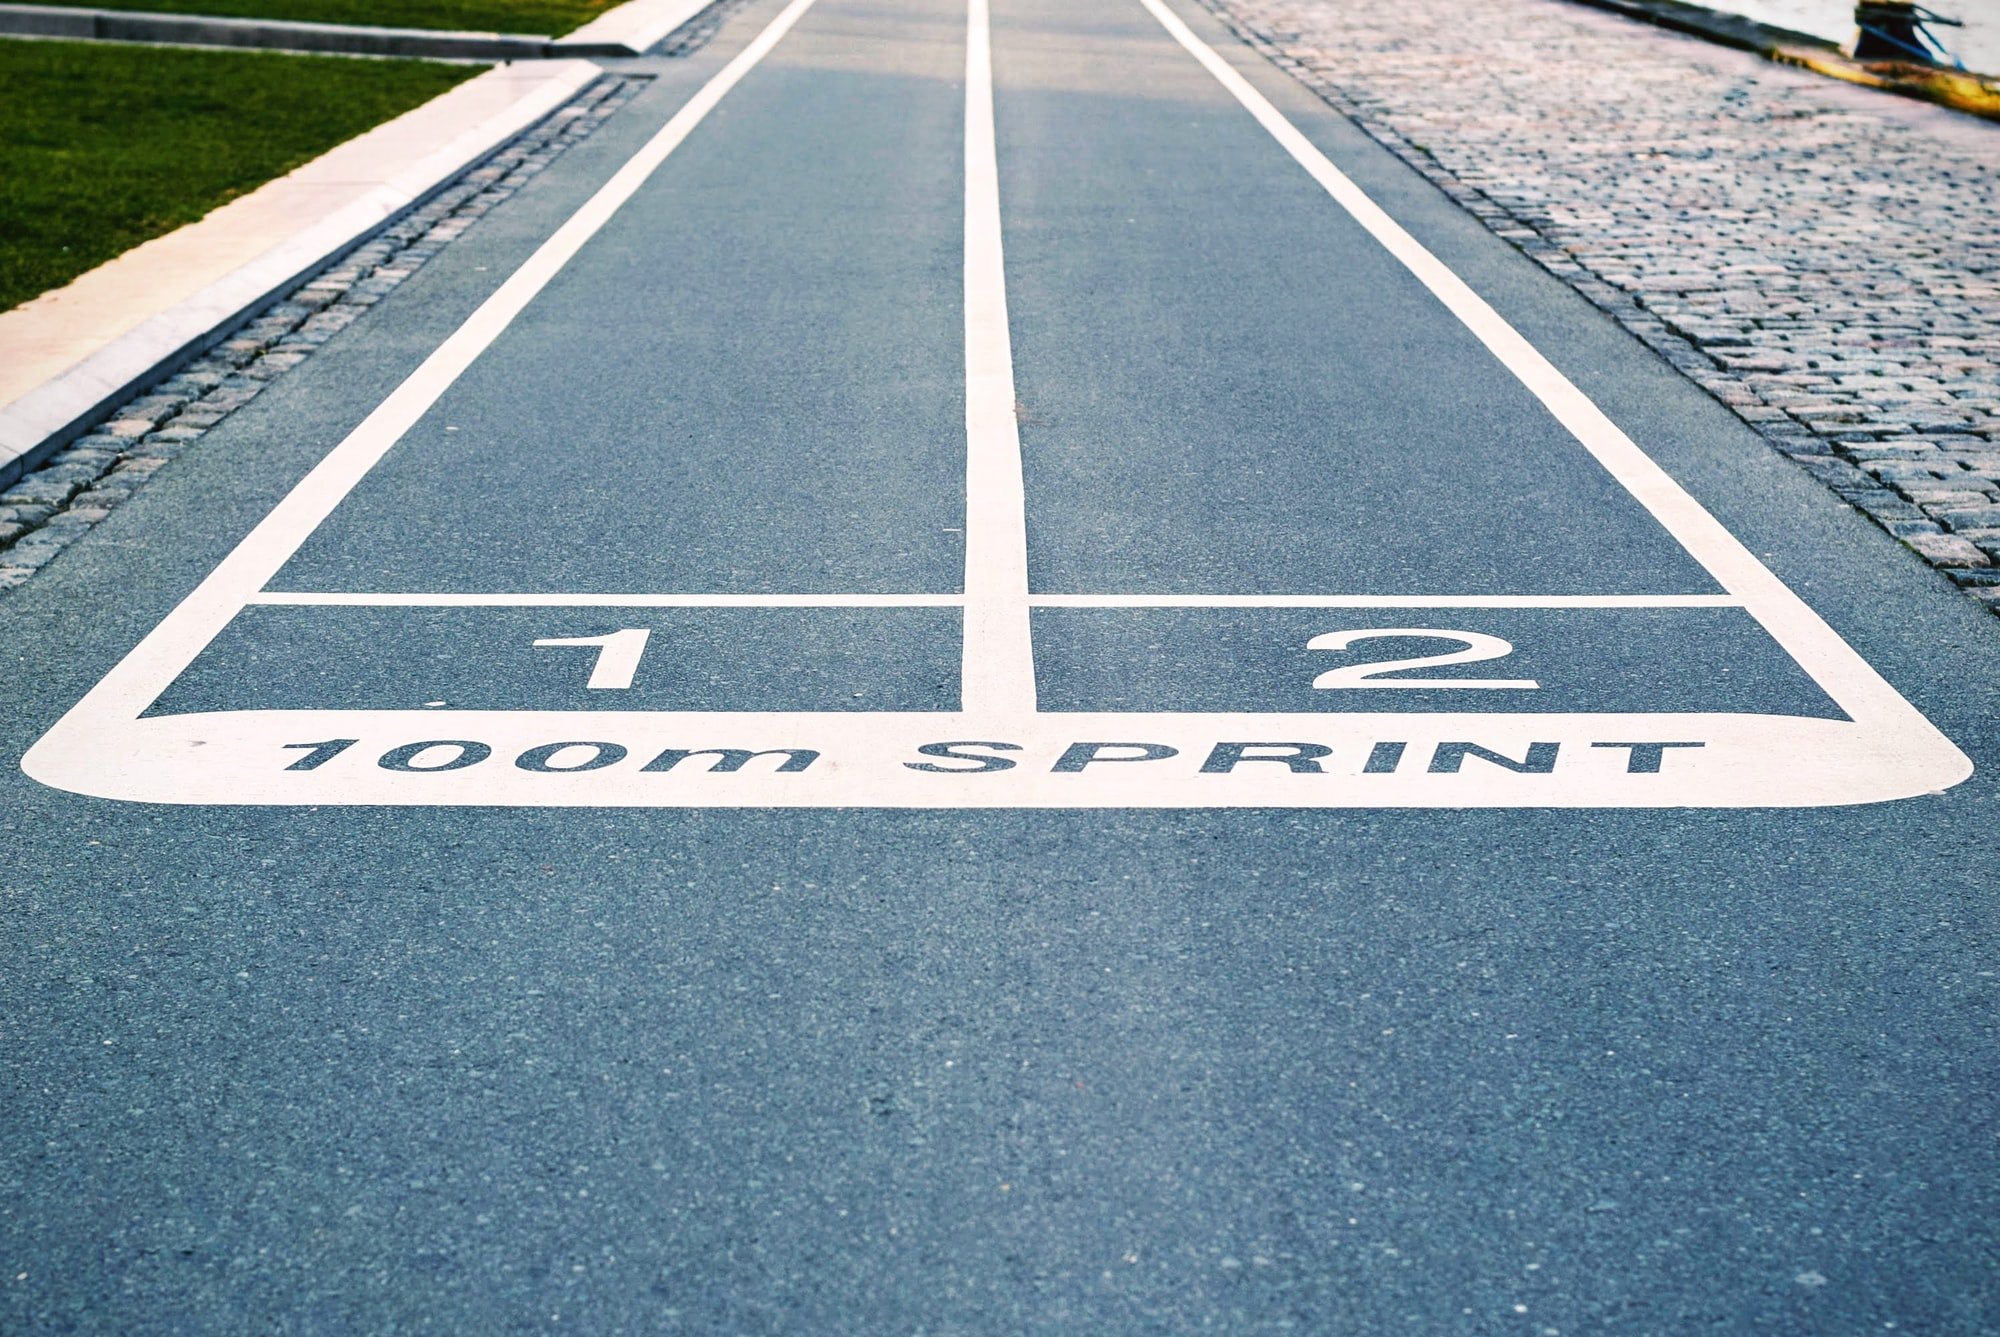 How do I plan my sprints?